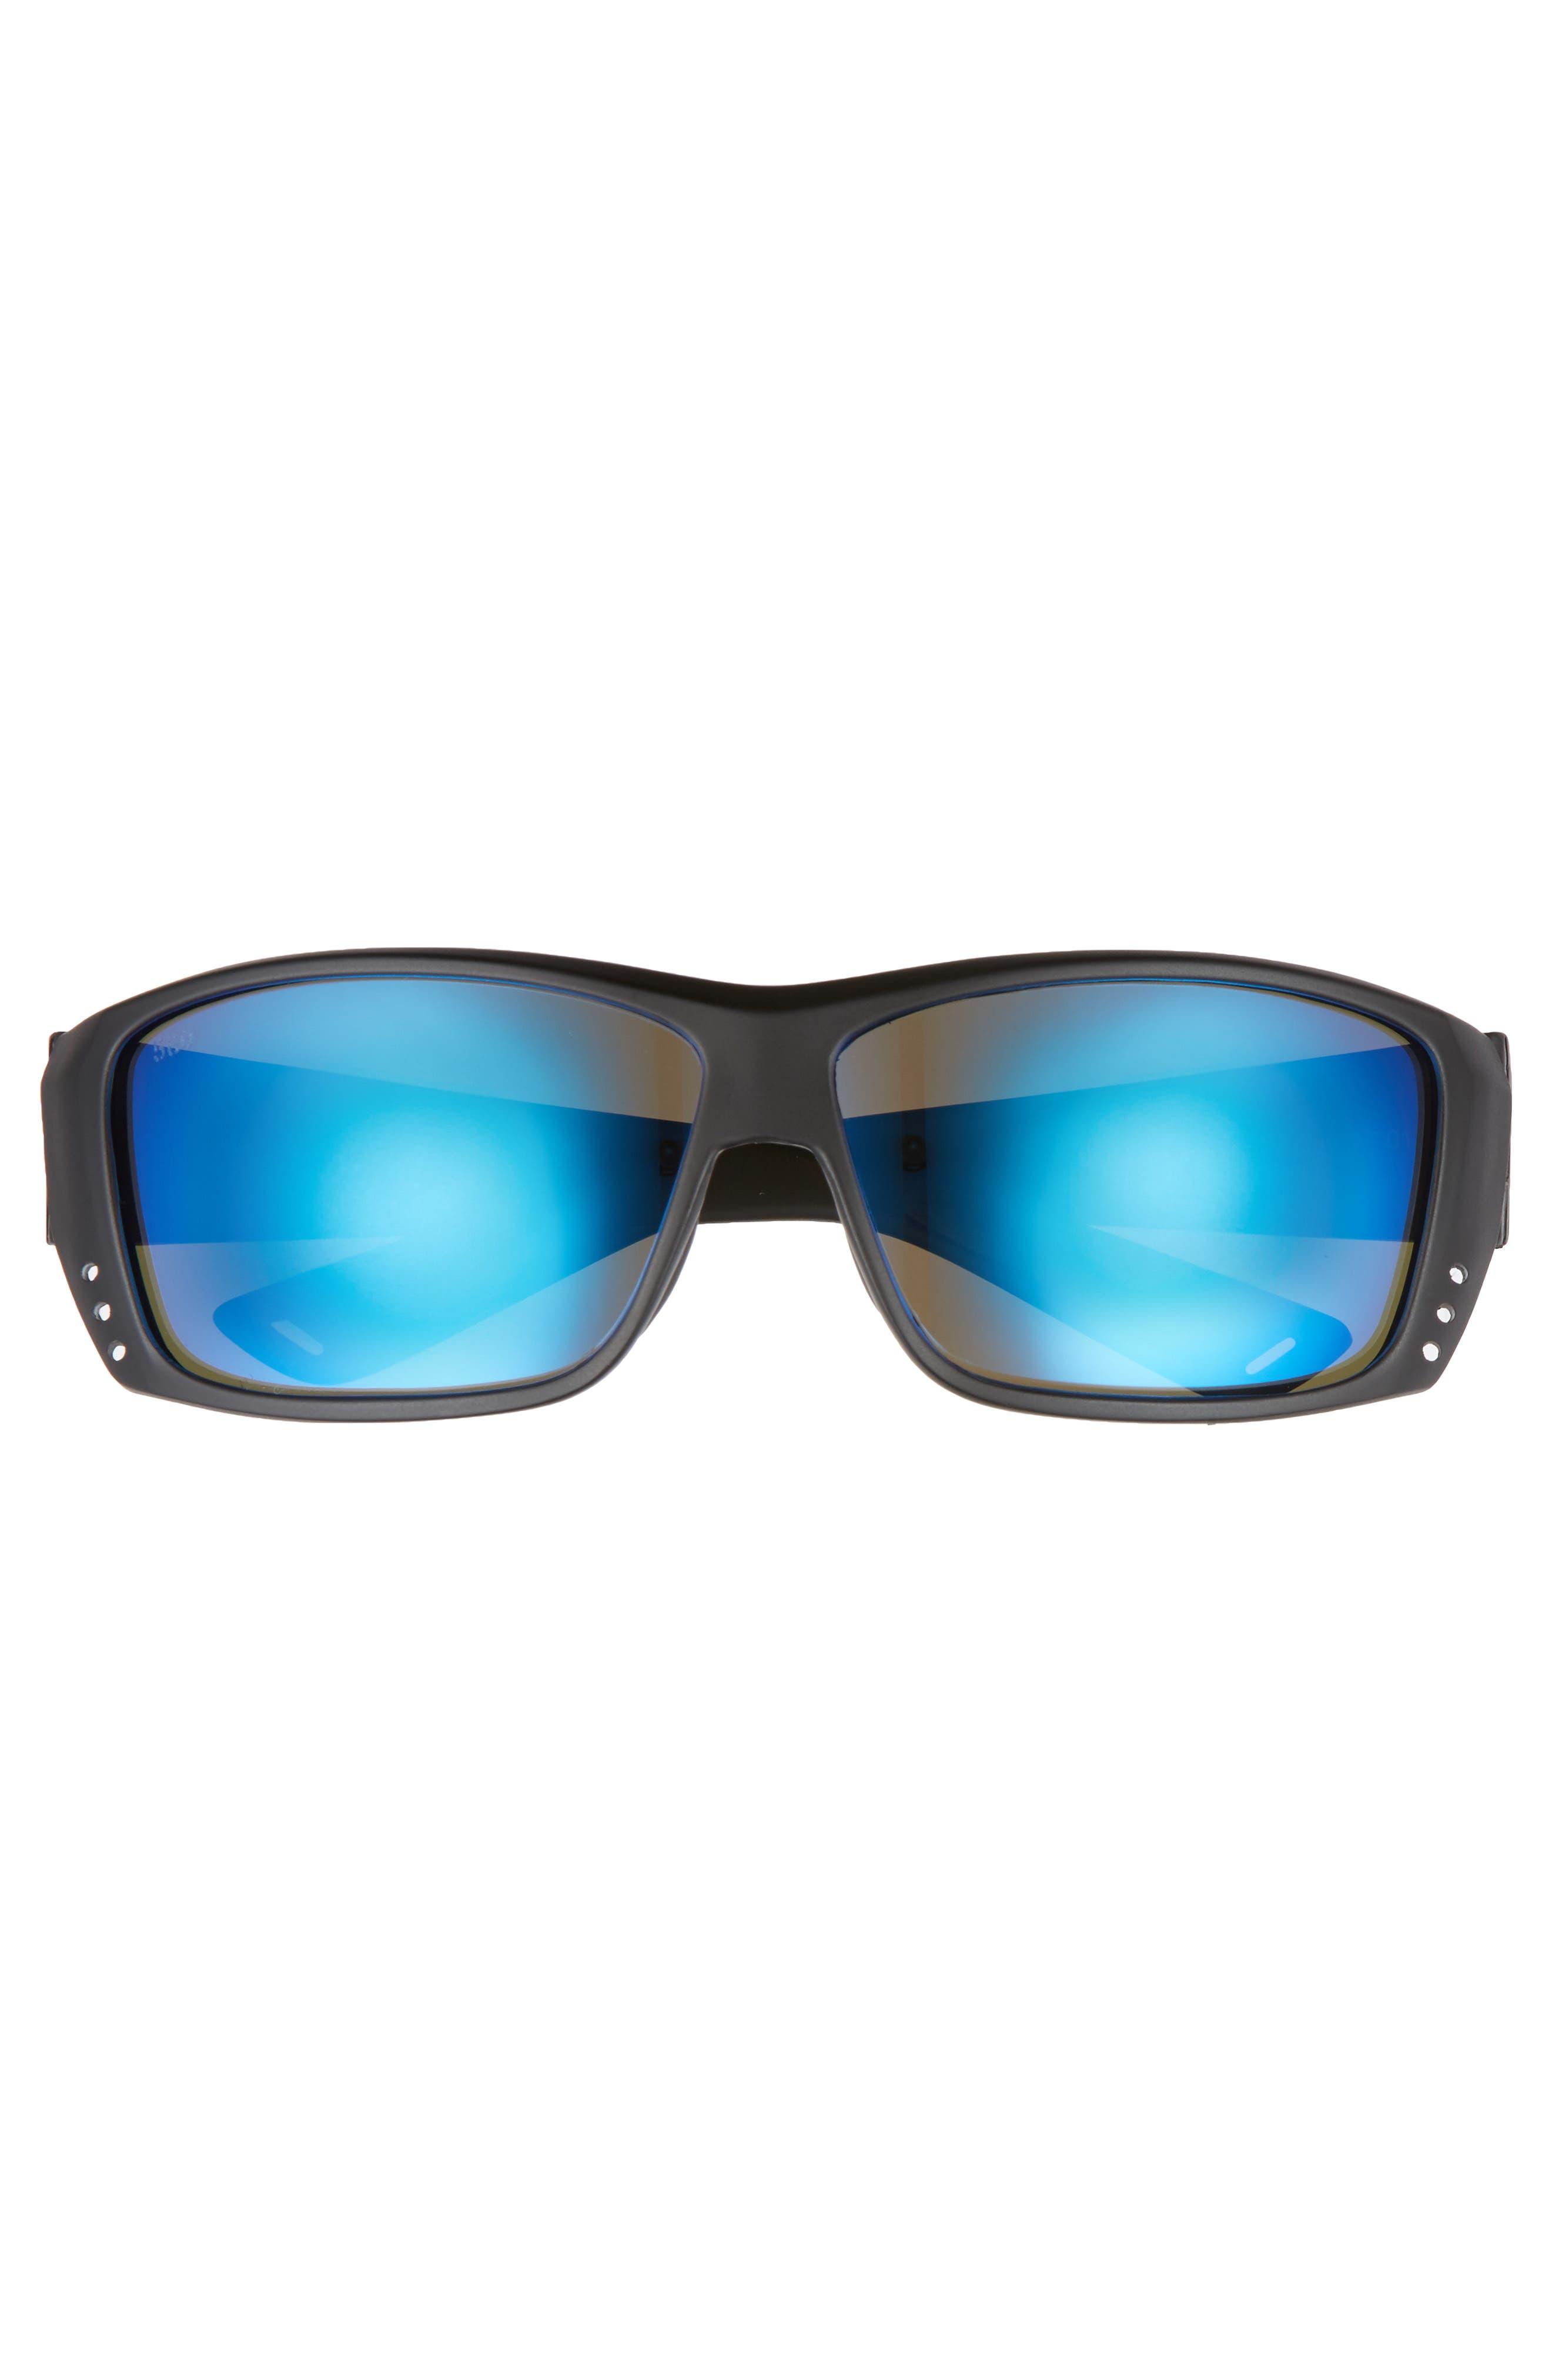 Cat Cay 60mm Polarized Sunglasses,                             Alternate thumbnail 2, color,                             Blackout/ Blue Mirror